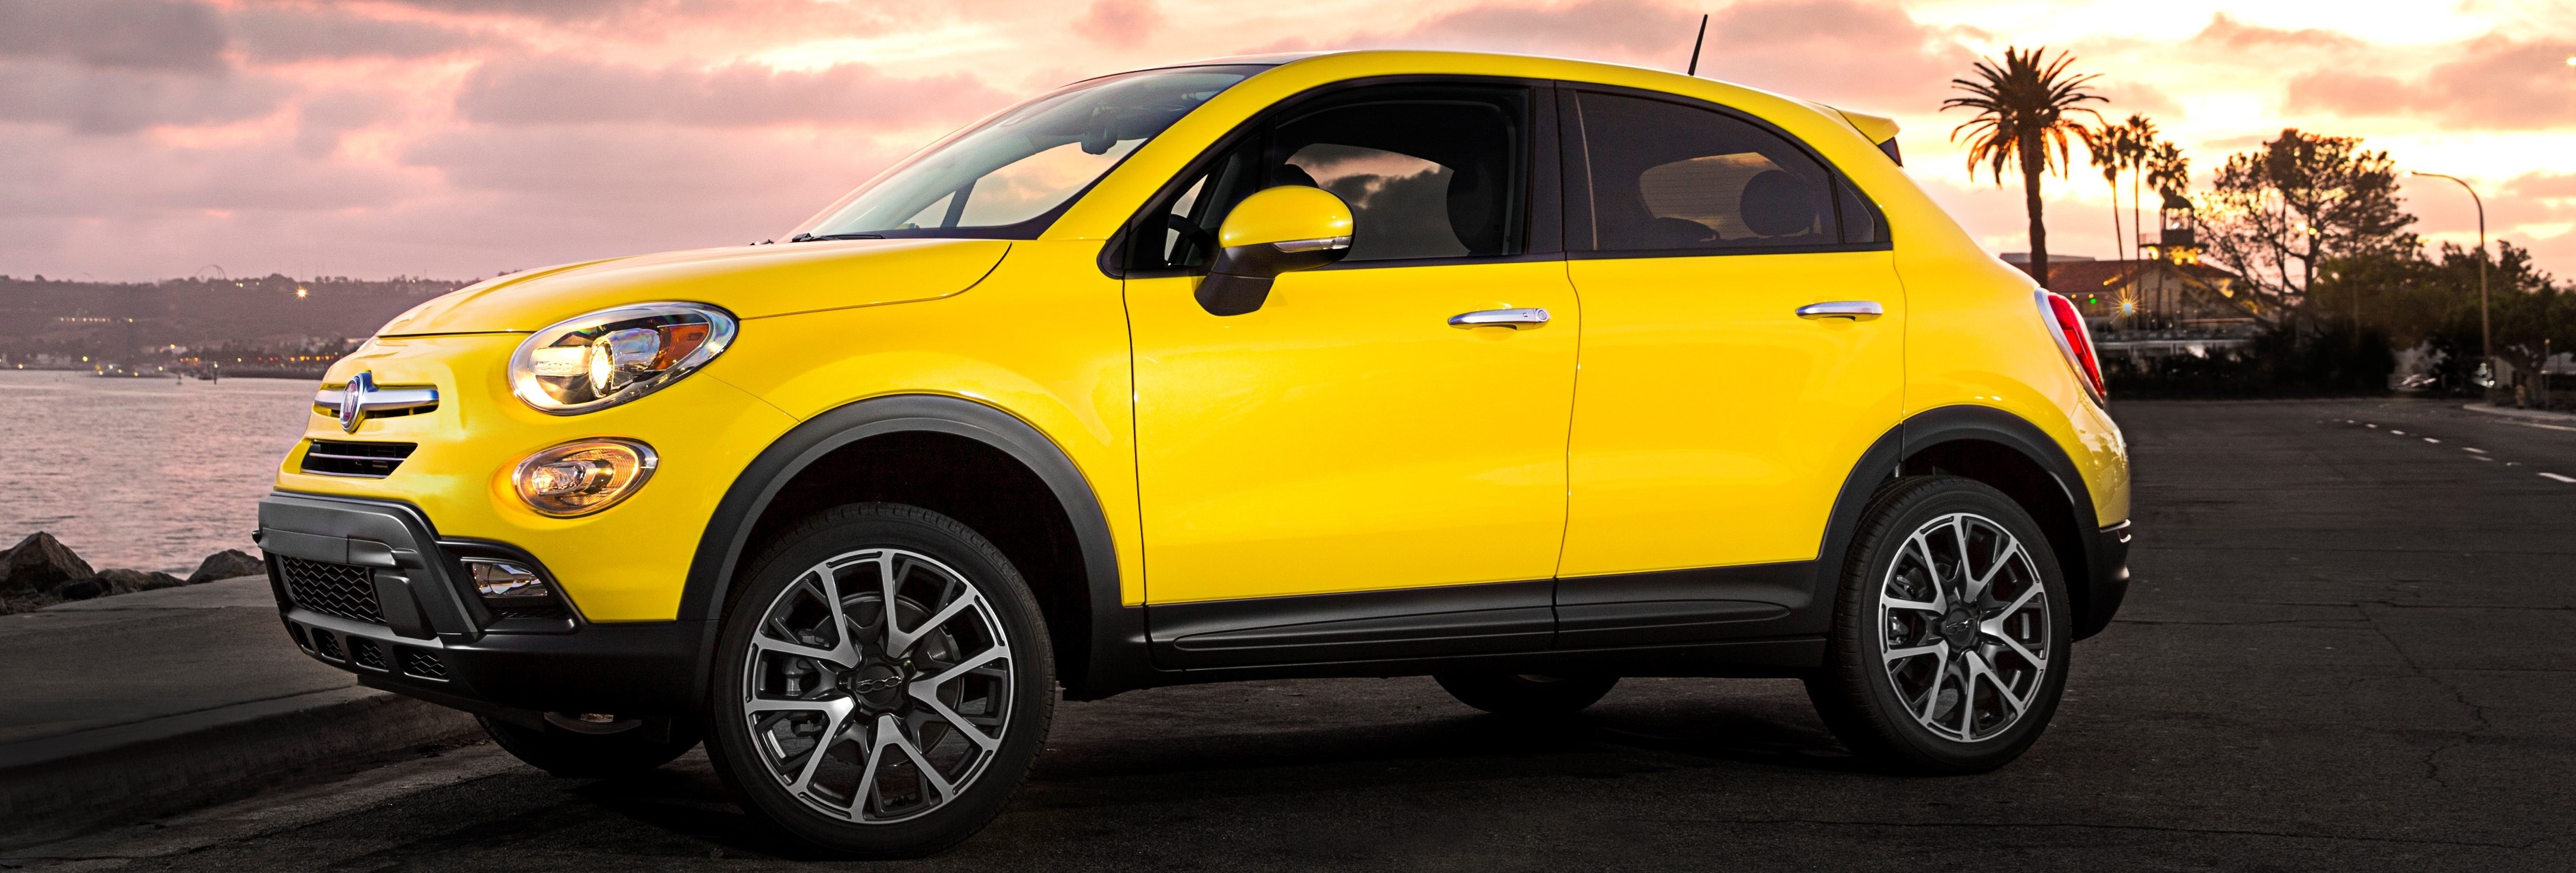 Fiat 500X: diseño para toda la familia